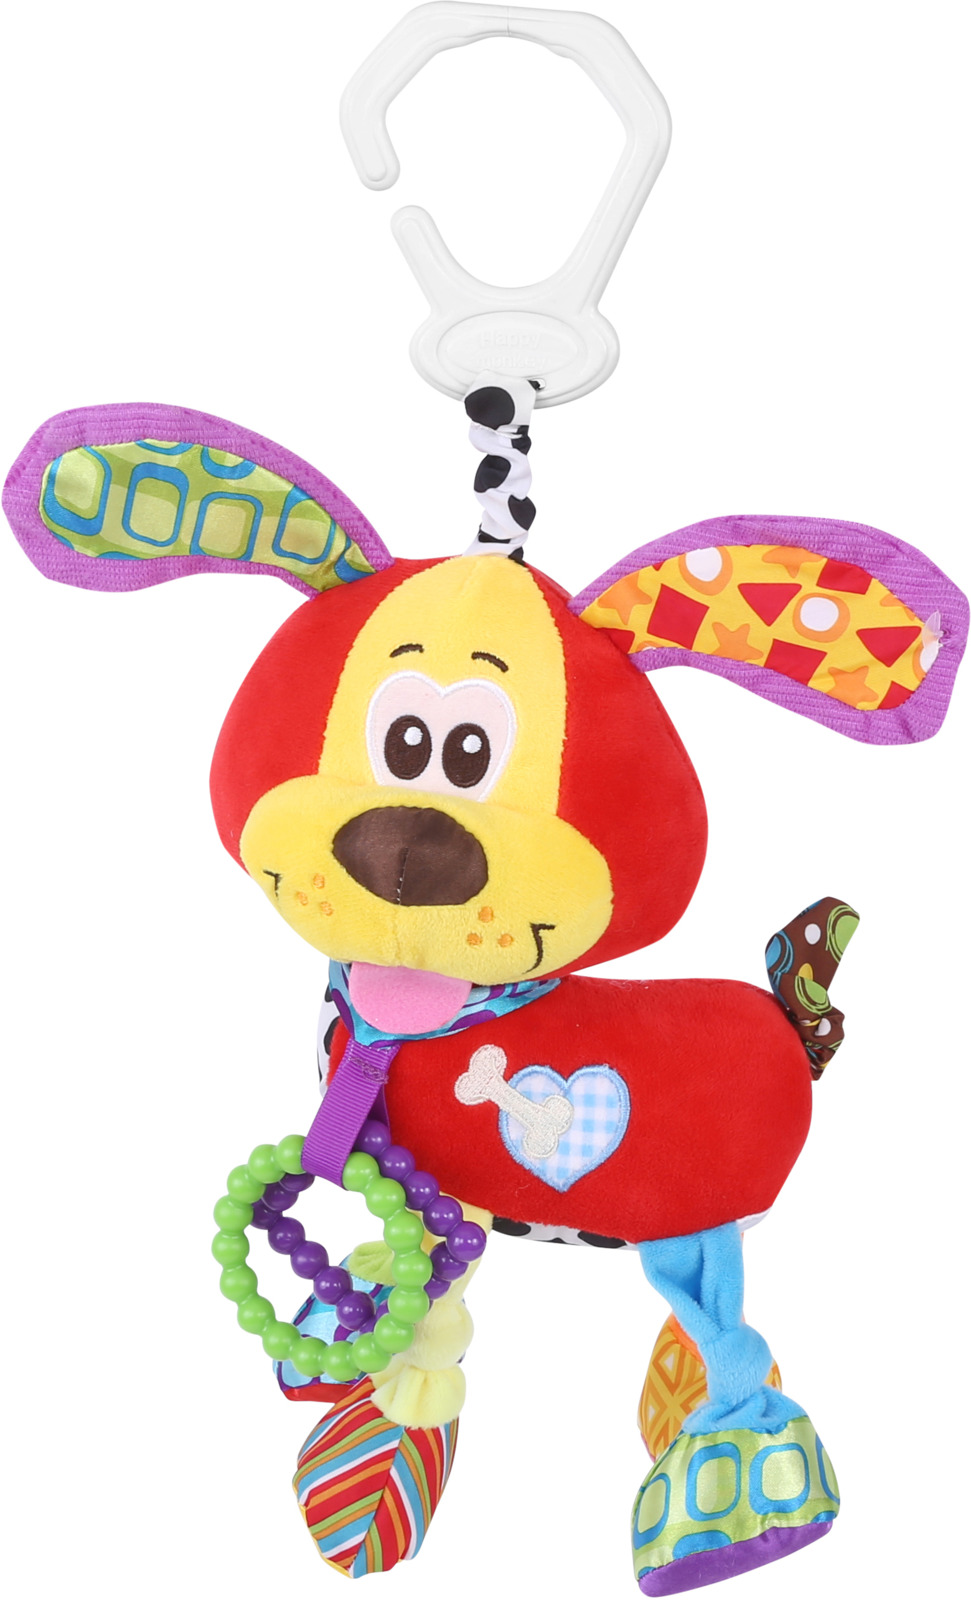 Развивающая игрушка Lorelli Toys Собачка. 1019114 развивающая игрушка lorelli toys слоник 1019117